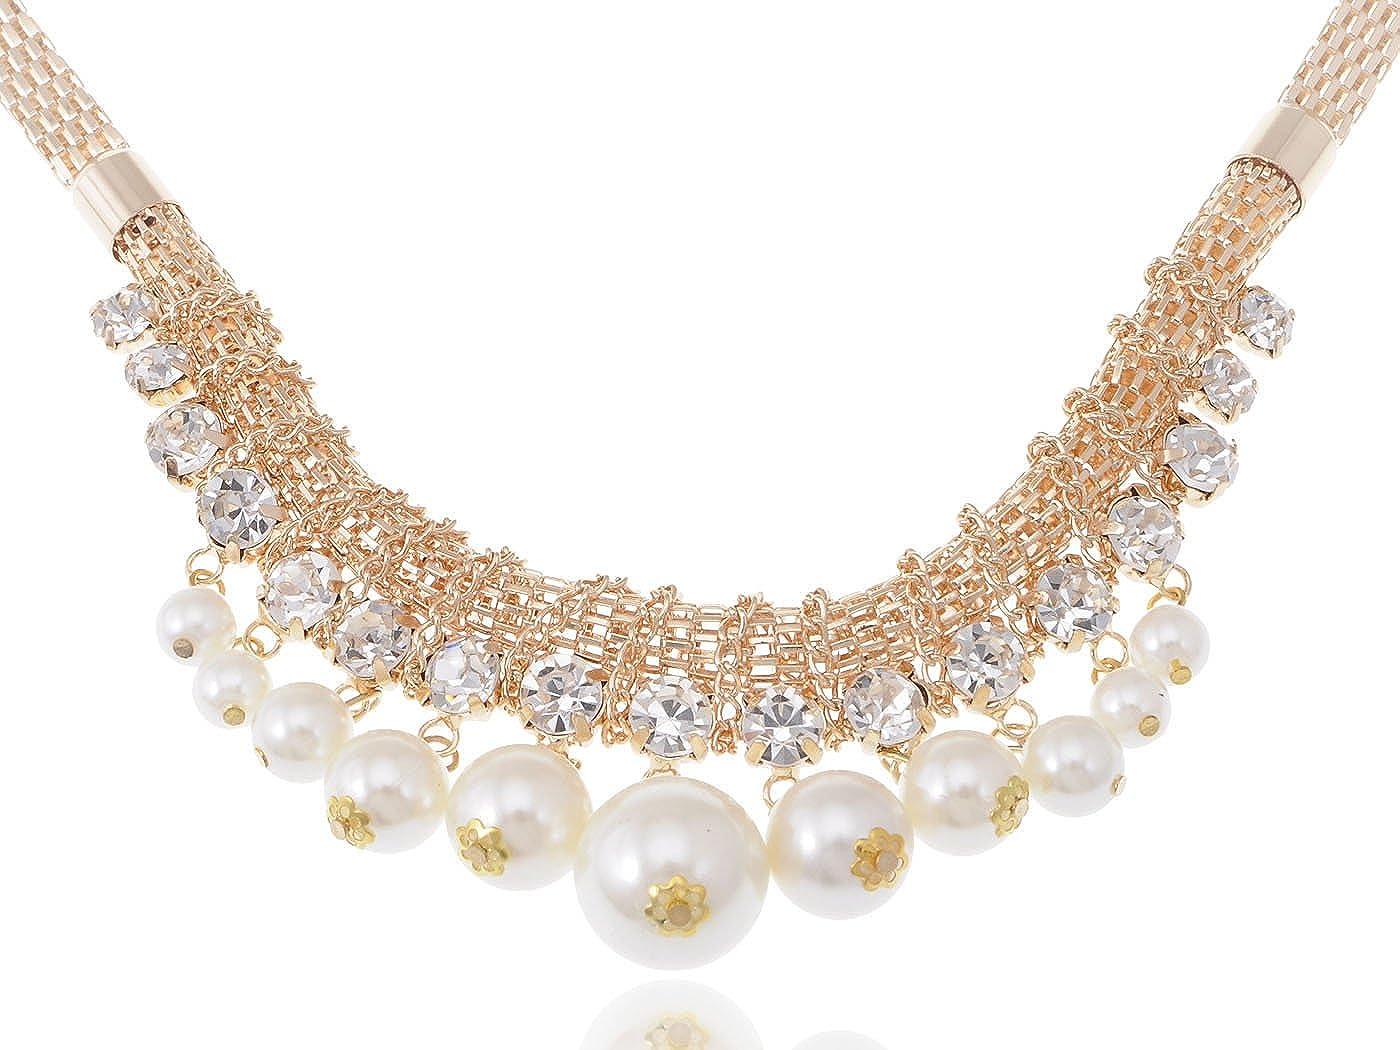 83eed80fffa49 Amazon.com: Alilang Women Gold Elegant Clear Rhinestone Pearl Woven ...